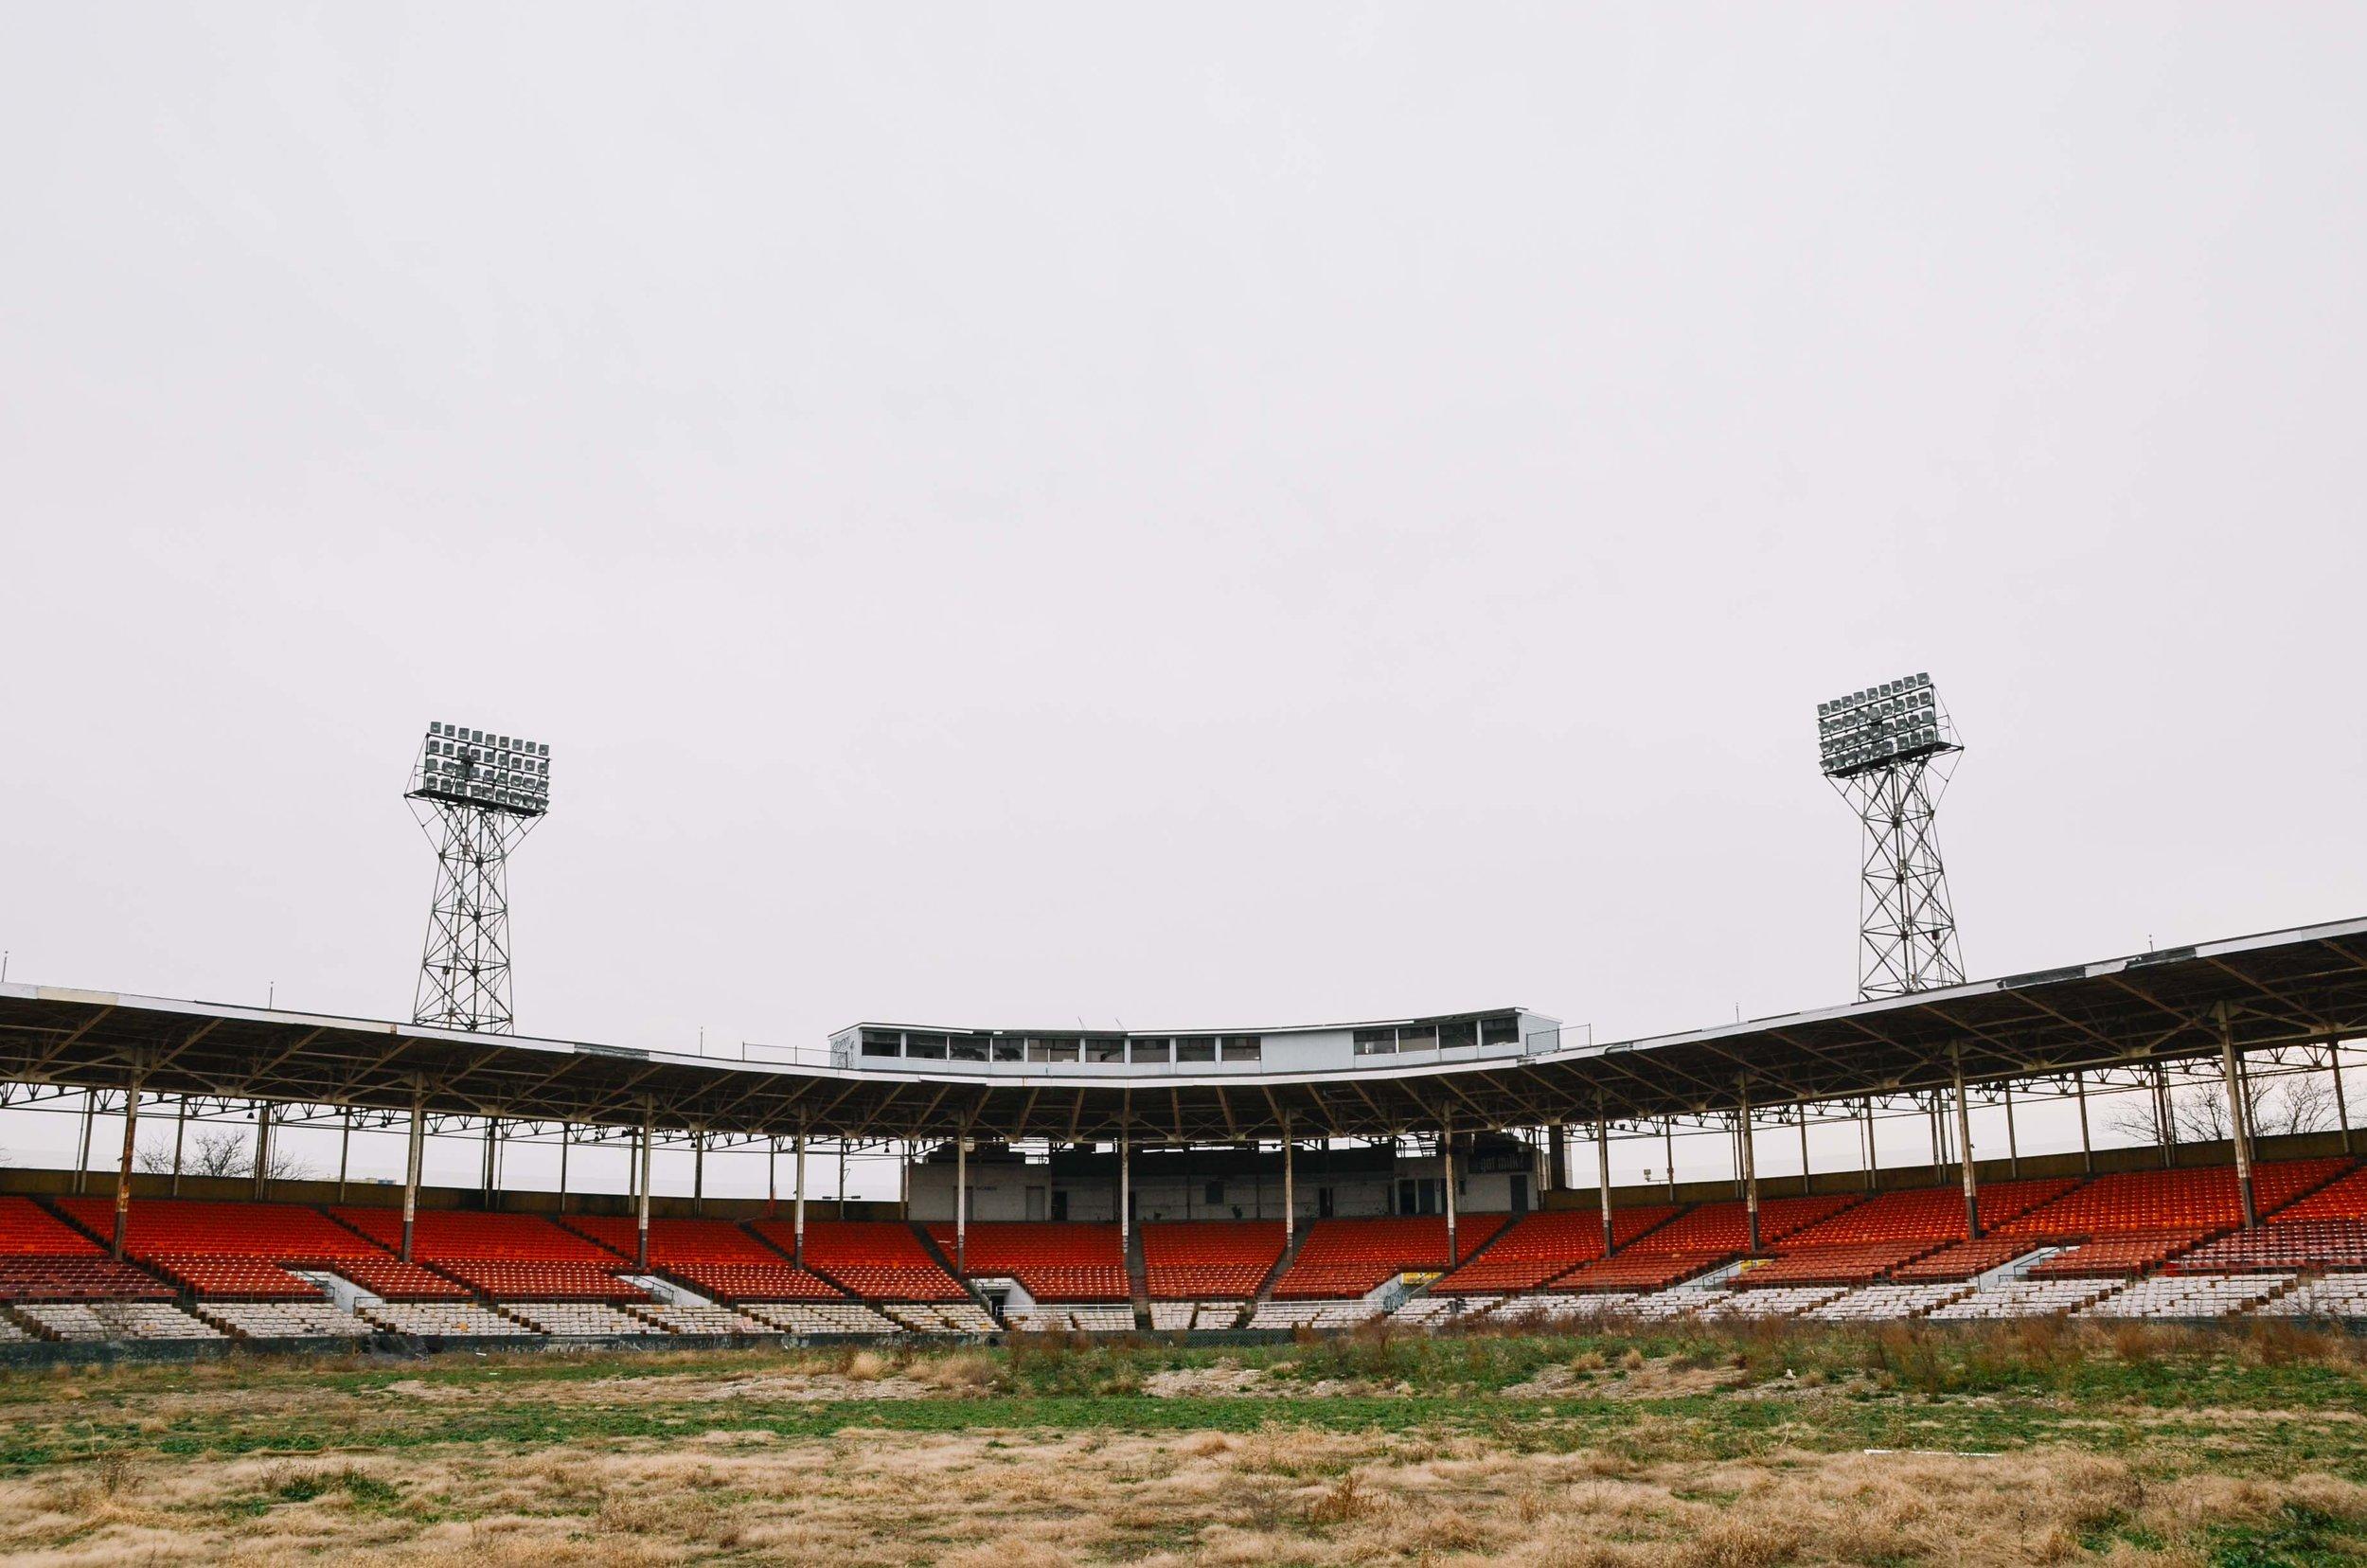 bush stadium seat salvage -